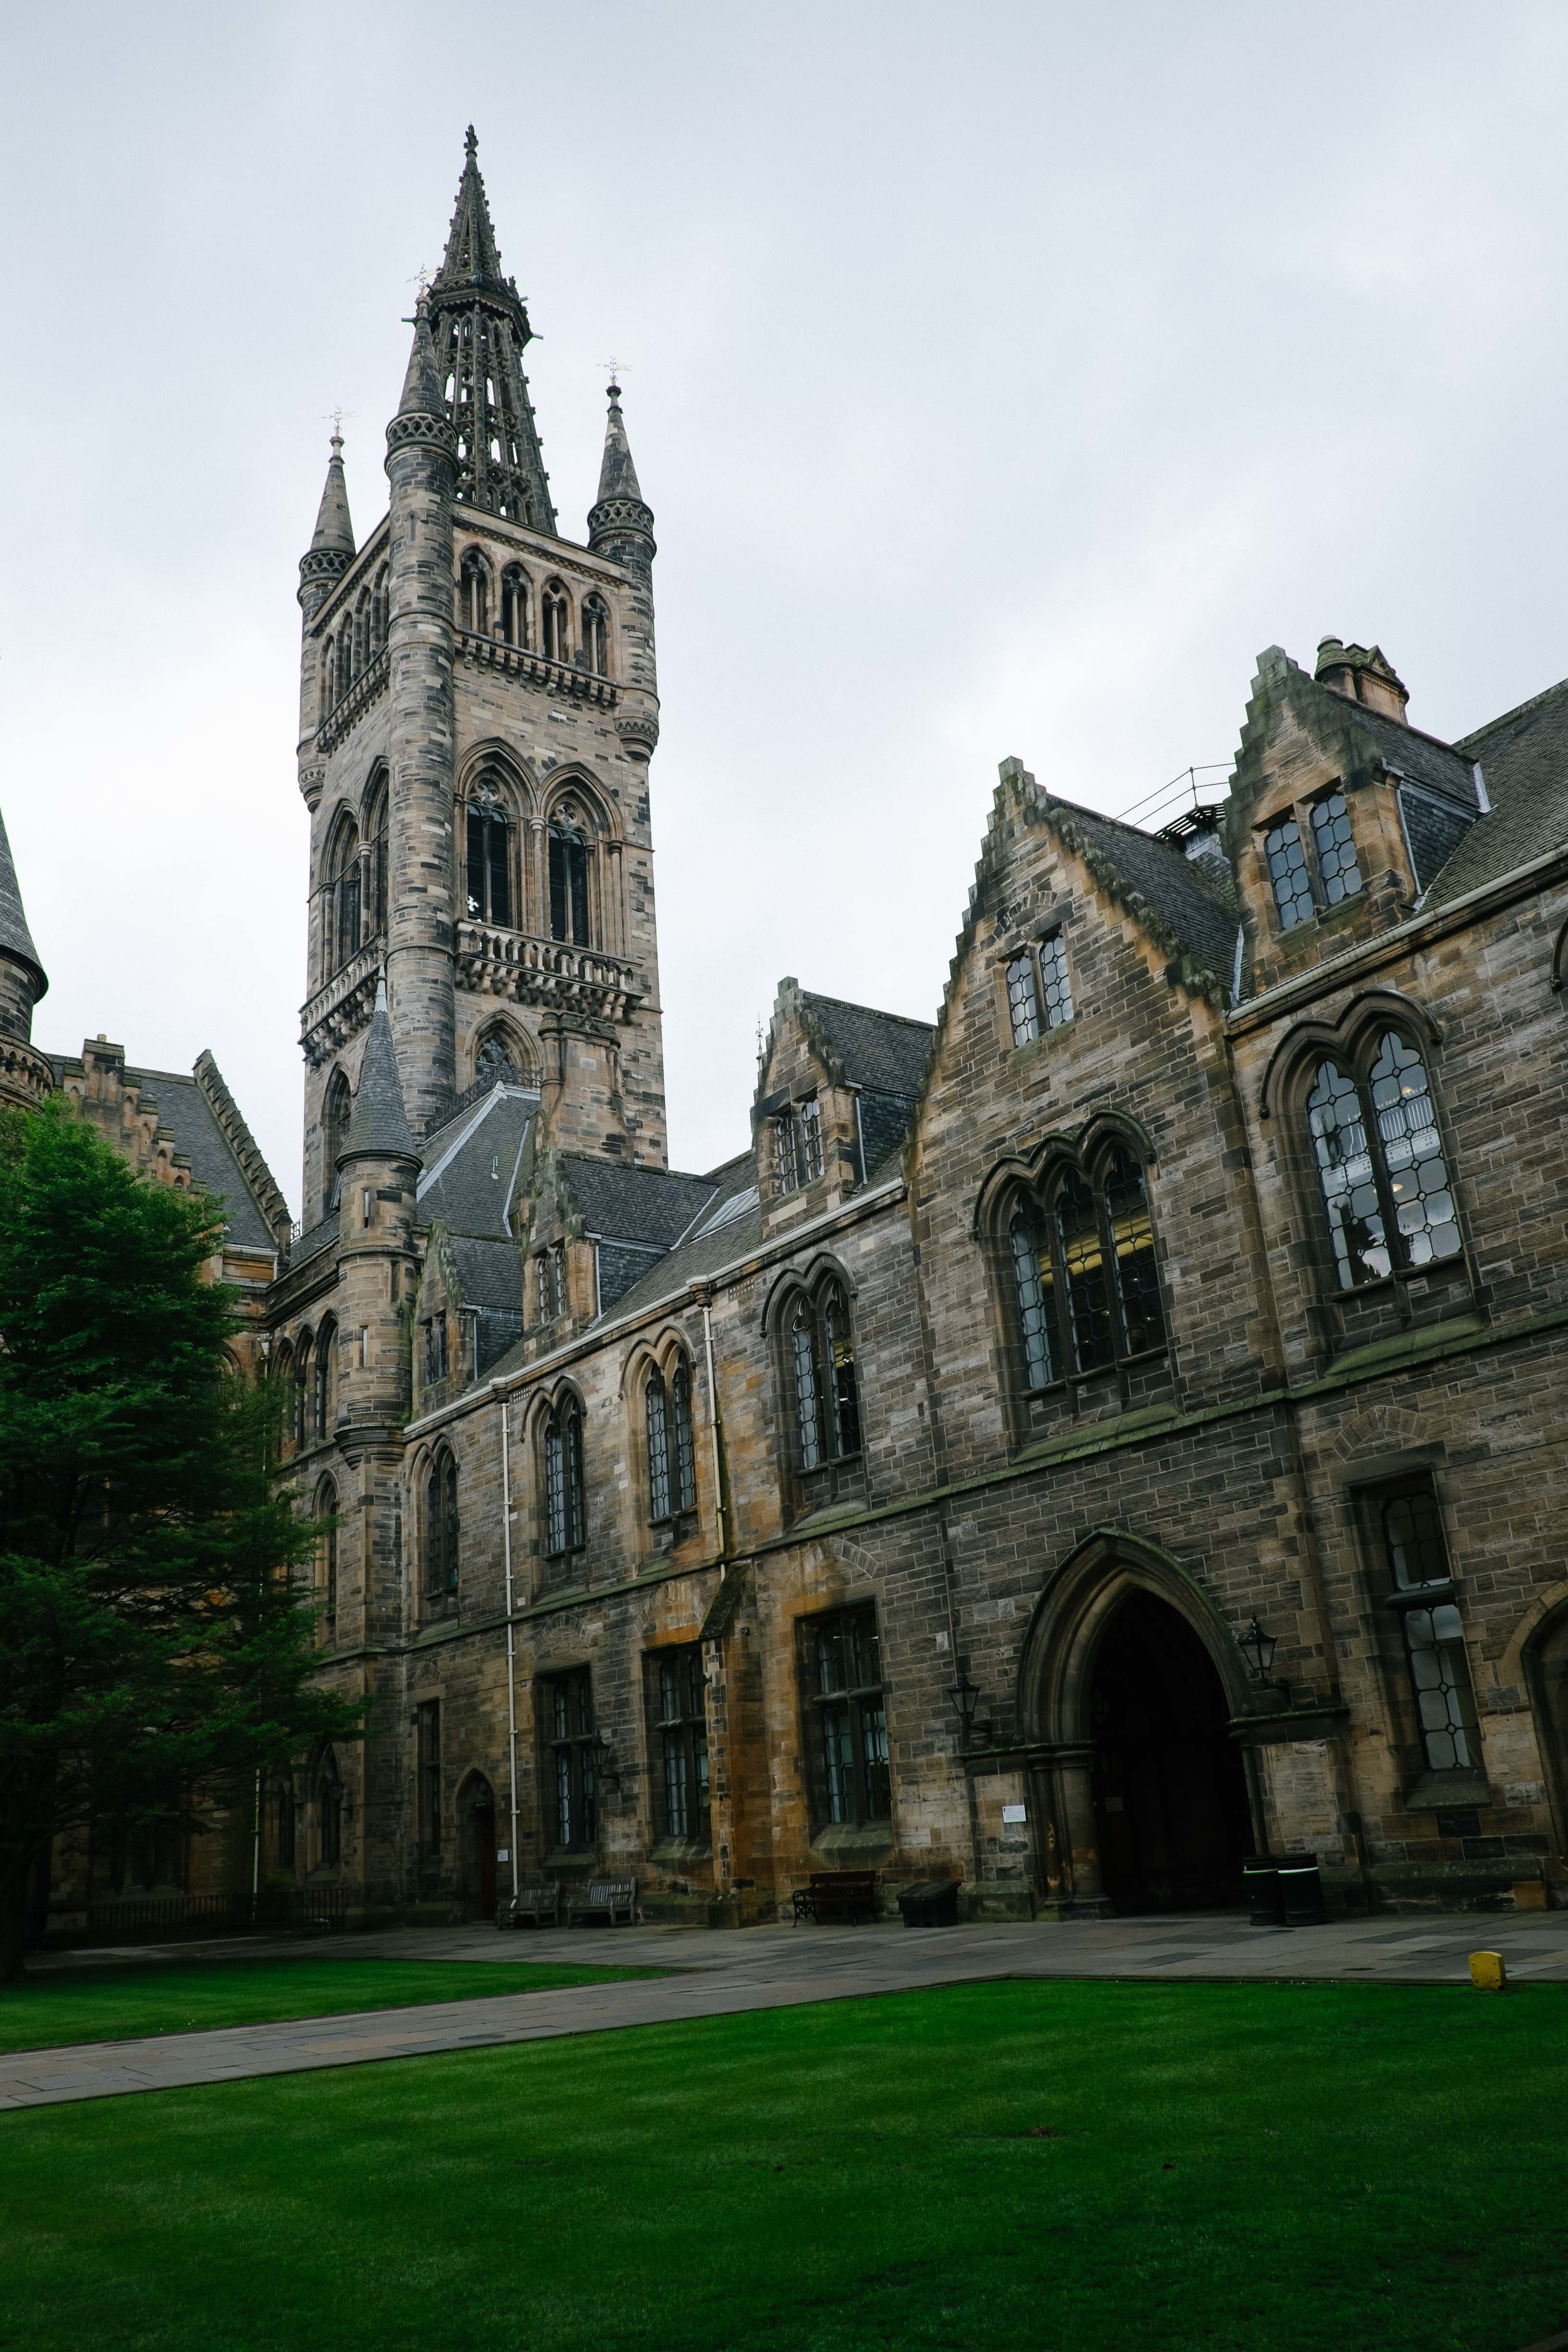 University of Glasgow - West Quadrangle/Gilbert Scott Building